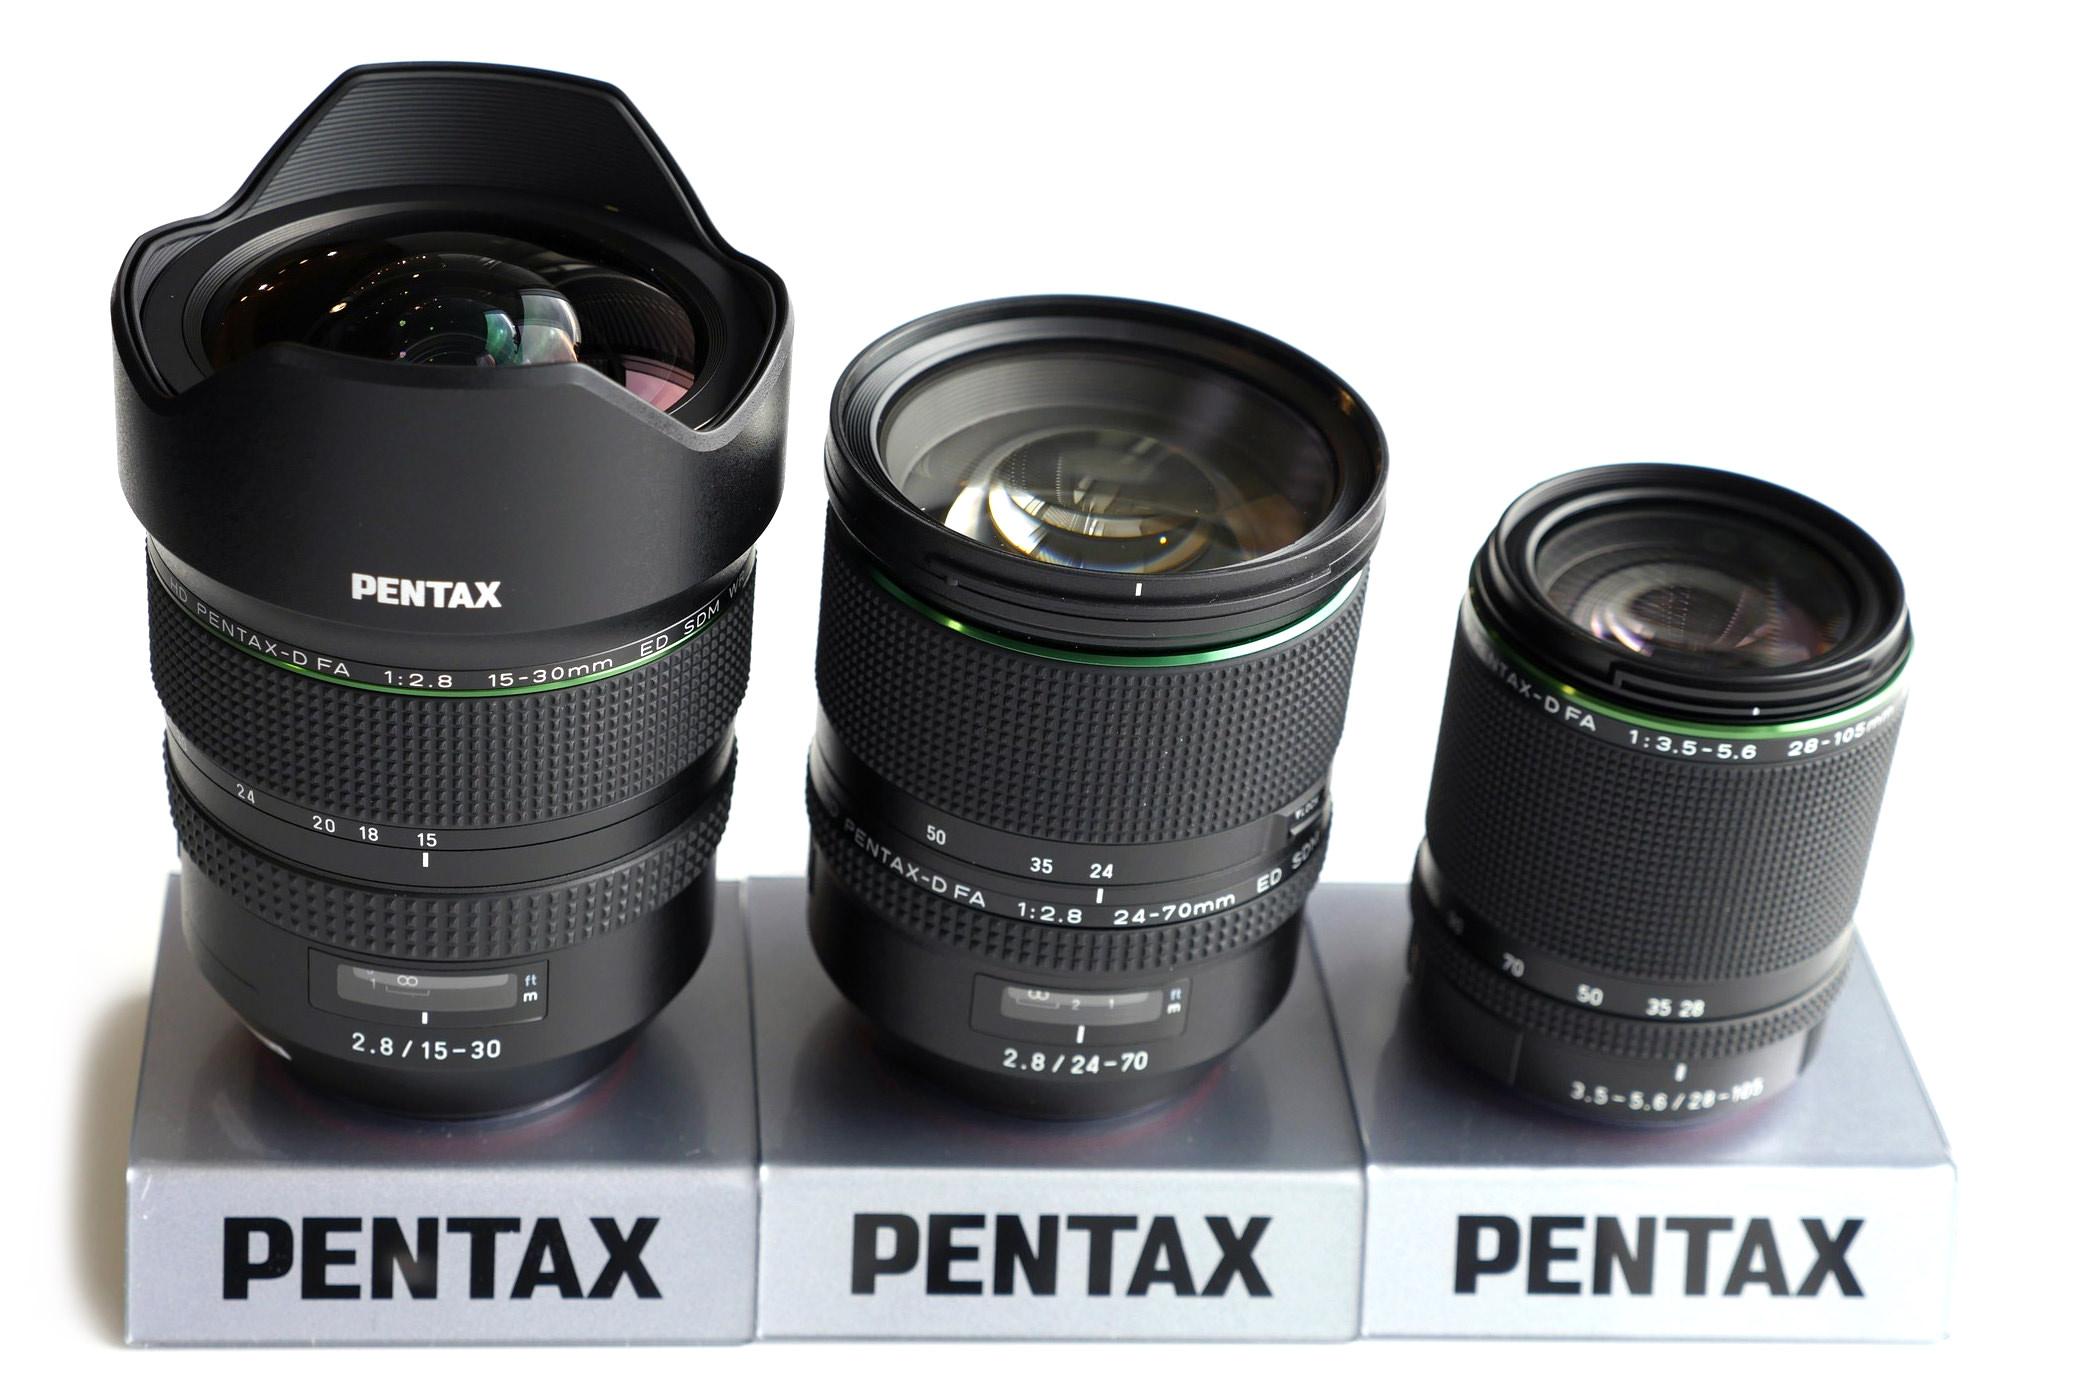 pentax ff fa lenses 24 70mm